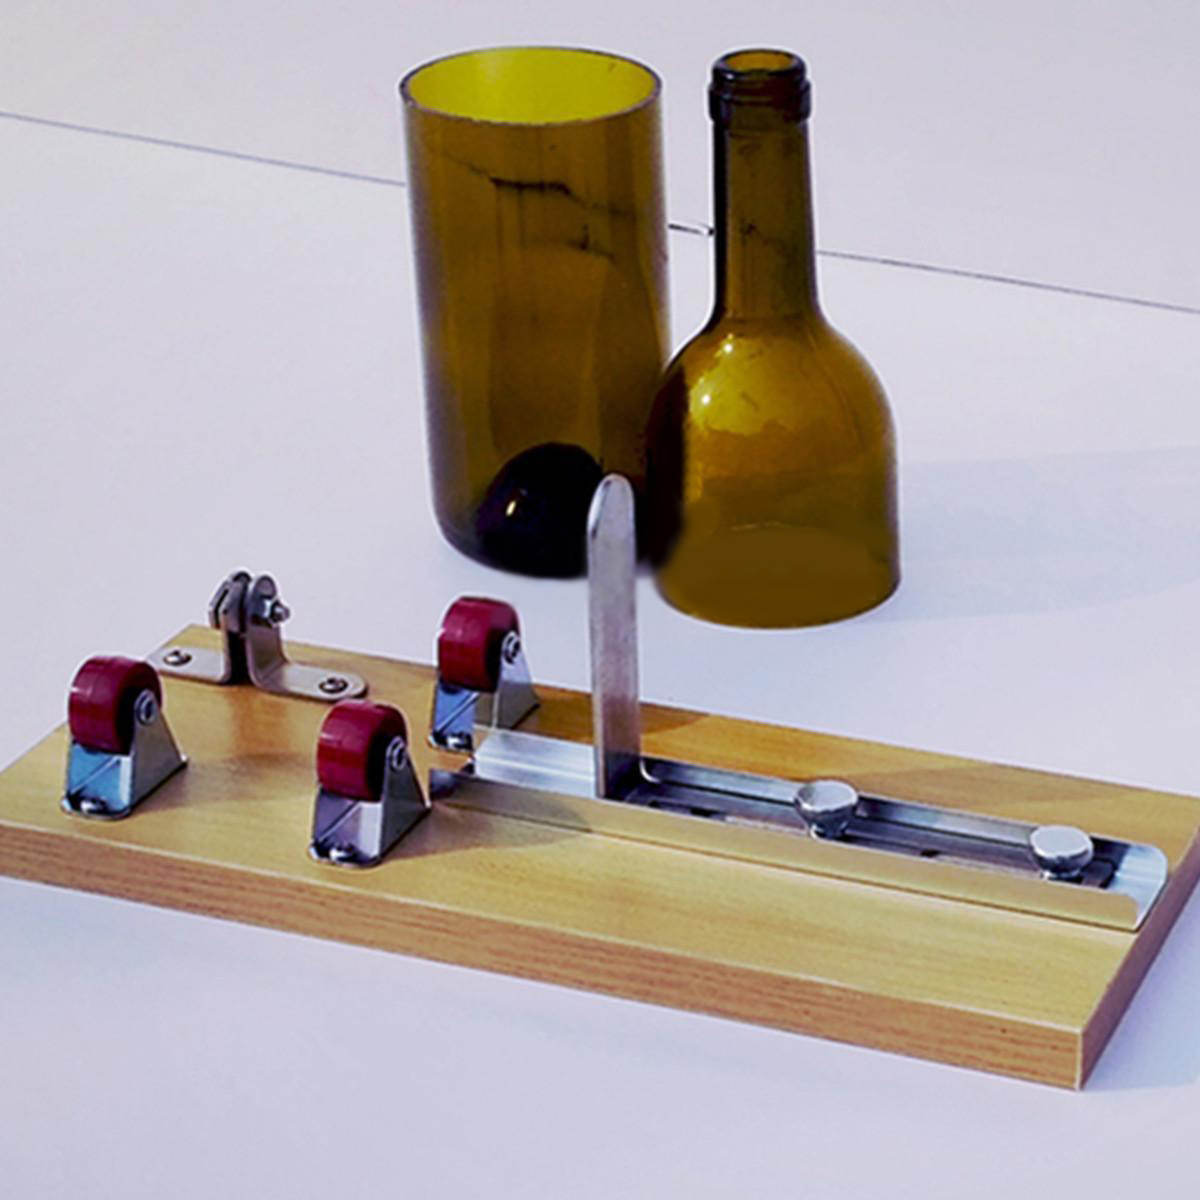 Uncategorized Bottle Cutter Diy durable wine beer glass bottle cutter machine mayitr jar for sculpture art cutting tool